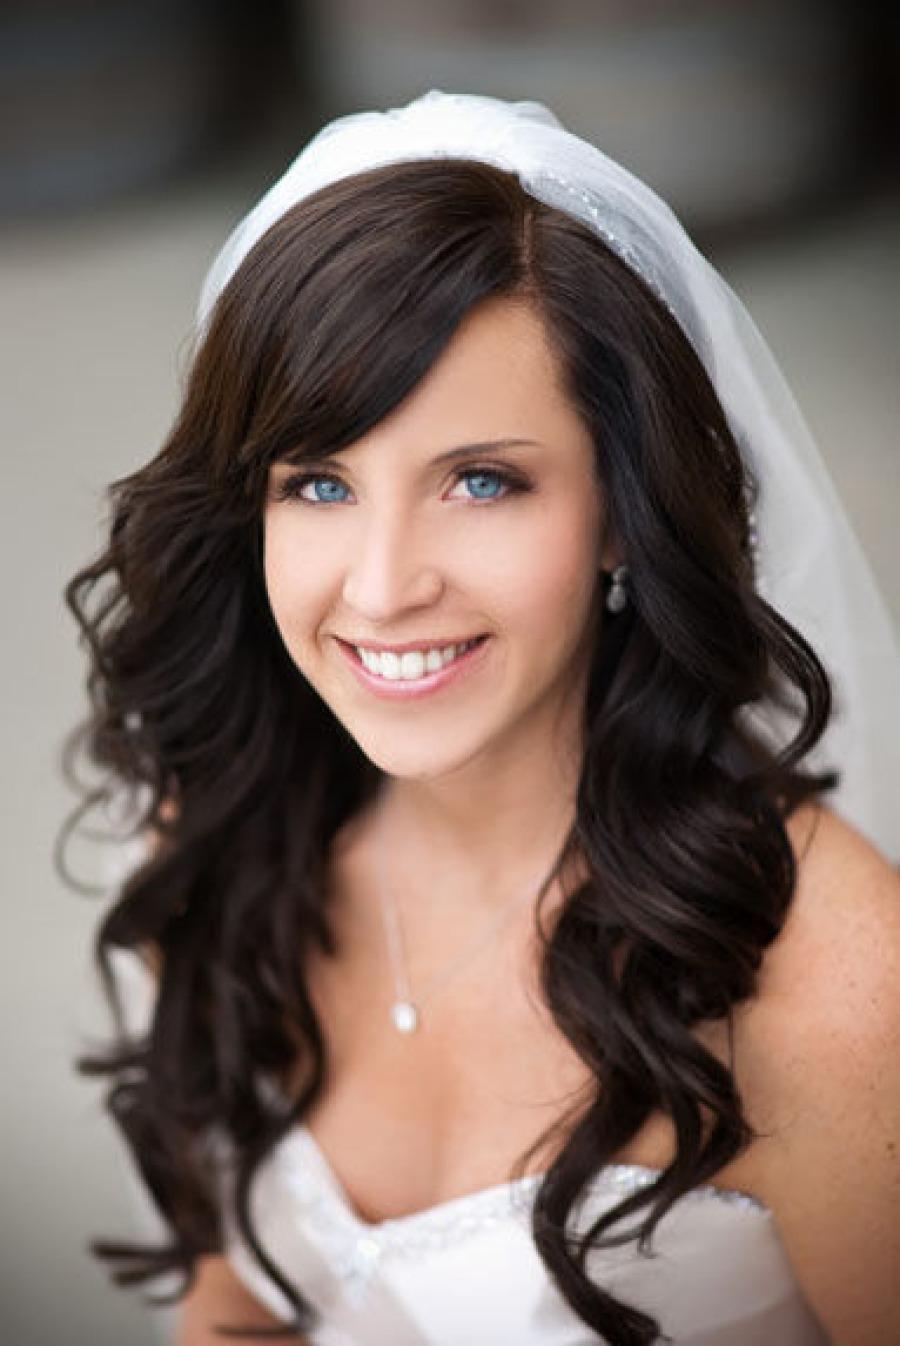 Pernikahan mengumpulkan gaya rambut dengan kerudung. Jenis gaya ... 10d76c5ee4